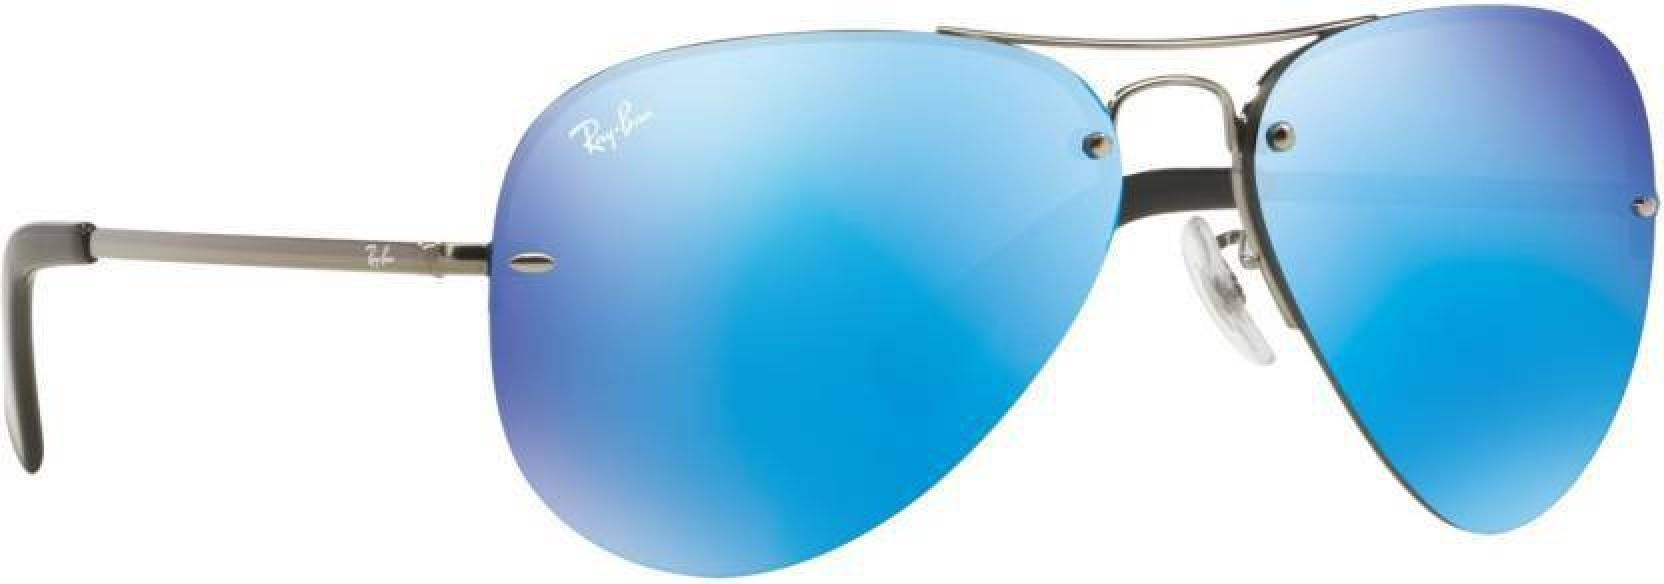 147256f44b Ray-Ban Aviator Sunglasses. Home